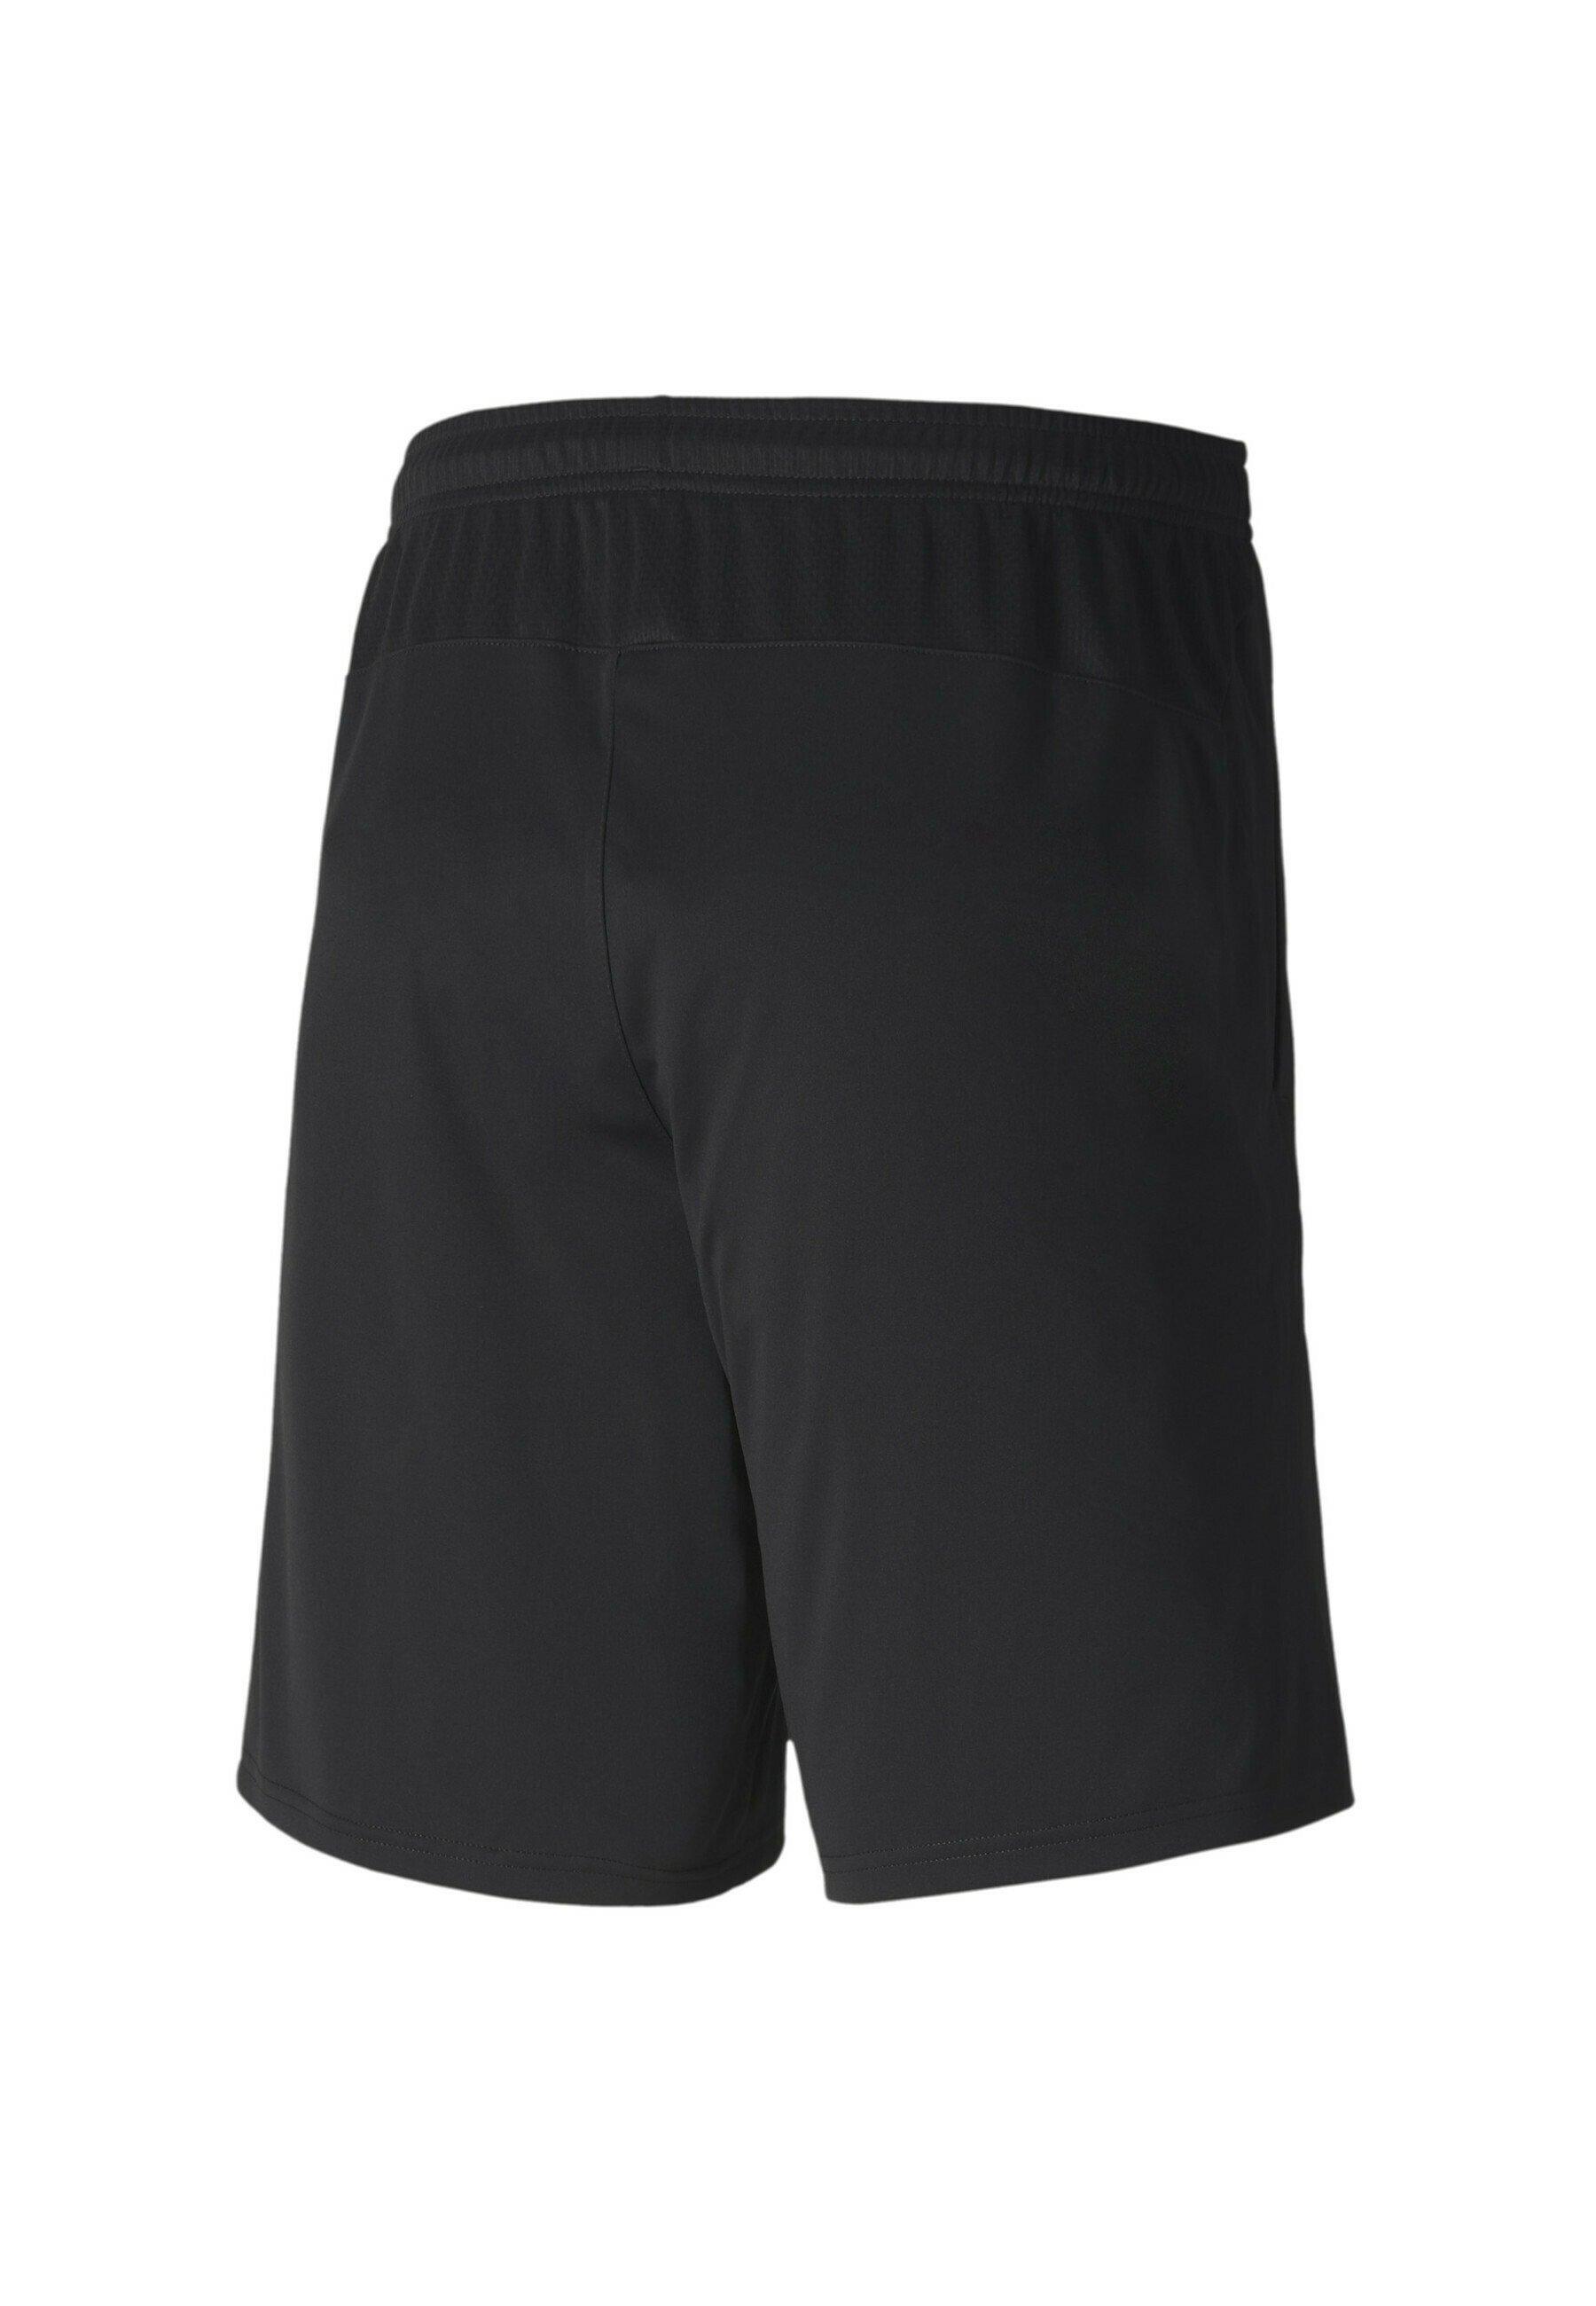 Herren CZECH REPUBLIC  - kurze Sporthose